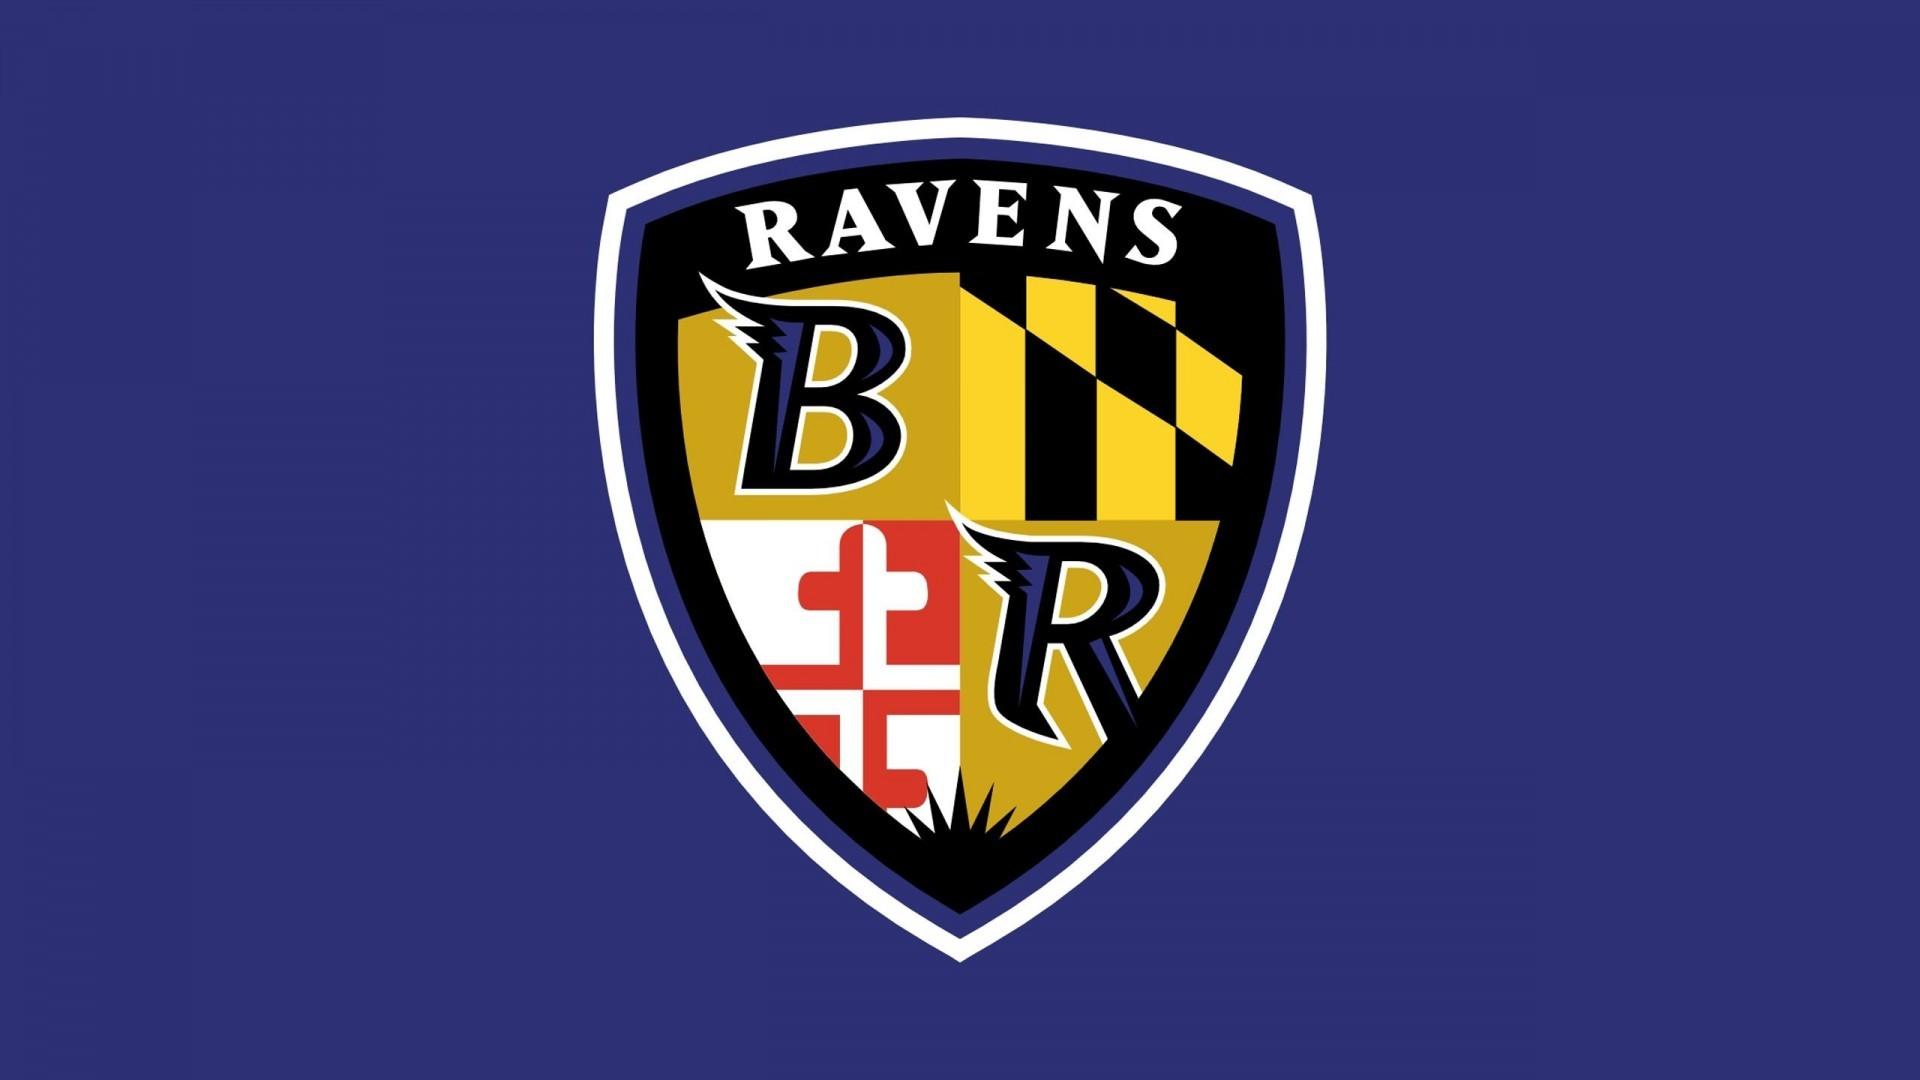 Baltimore Ravens HD k Schedule Wallpaper Baltimore Ravens Wallpaper  Wallpapers)